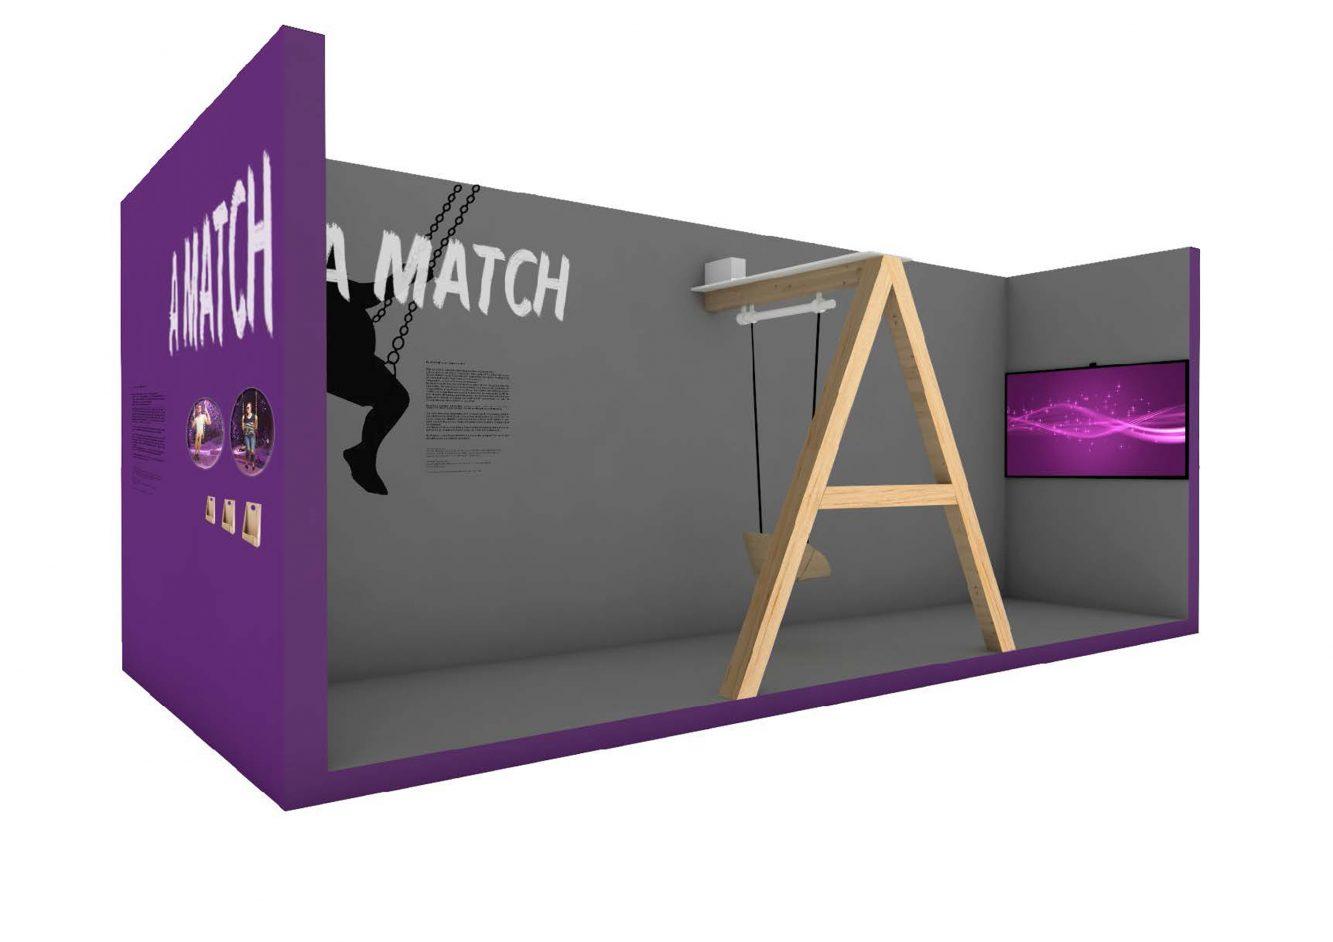 Domotex_Framing Trends_A Match_Sarah Busching_2